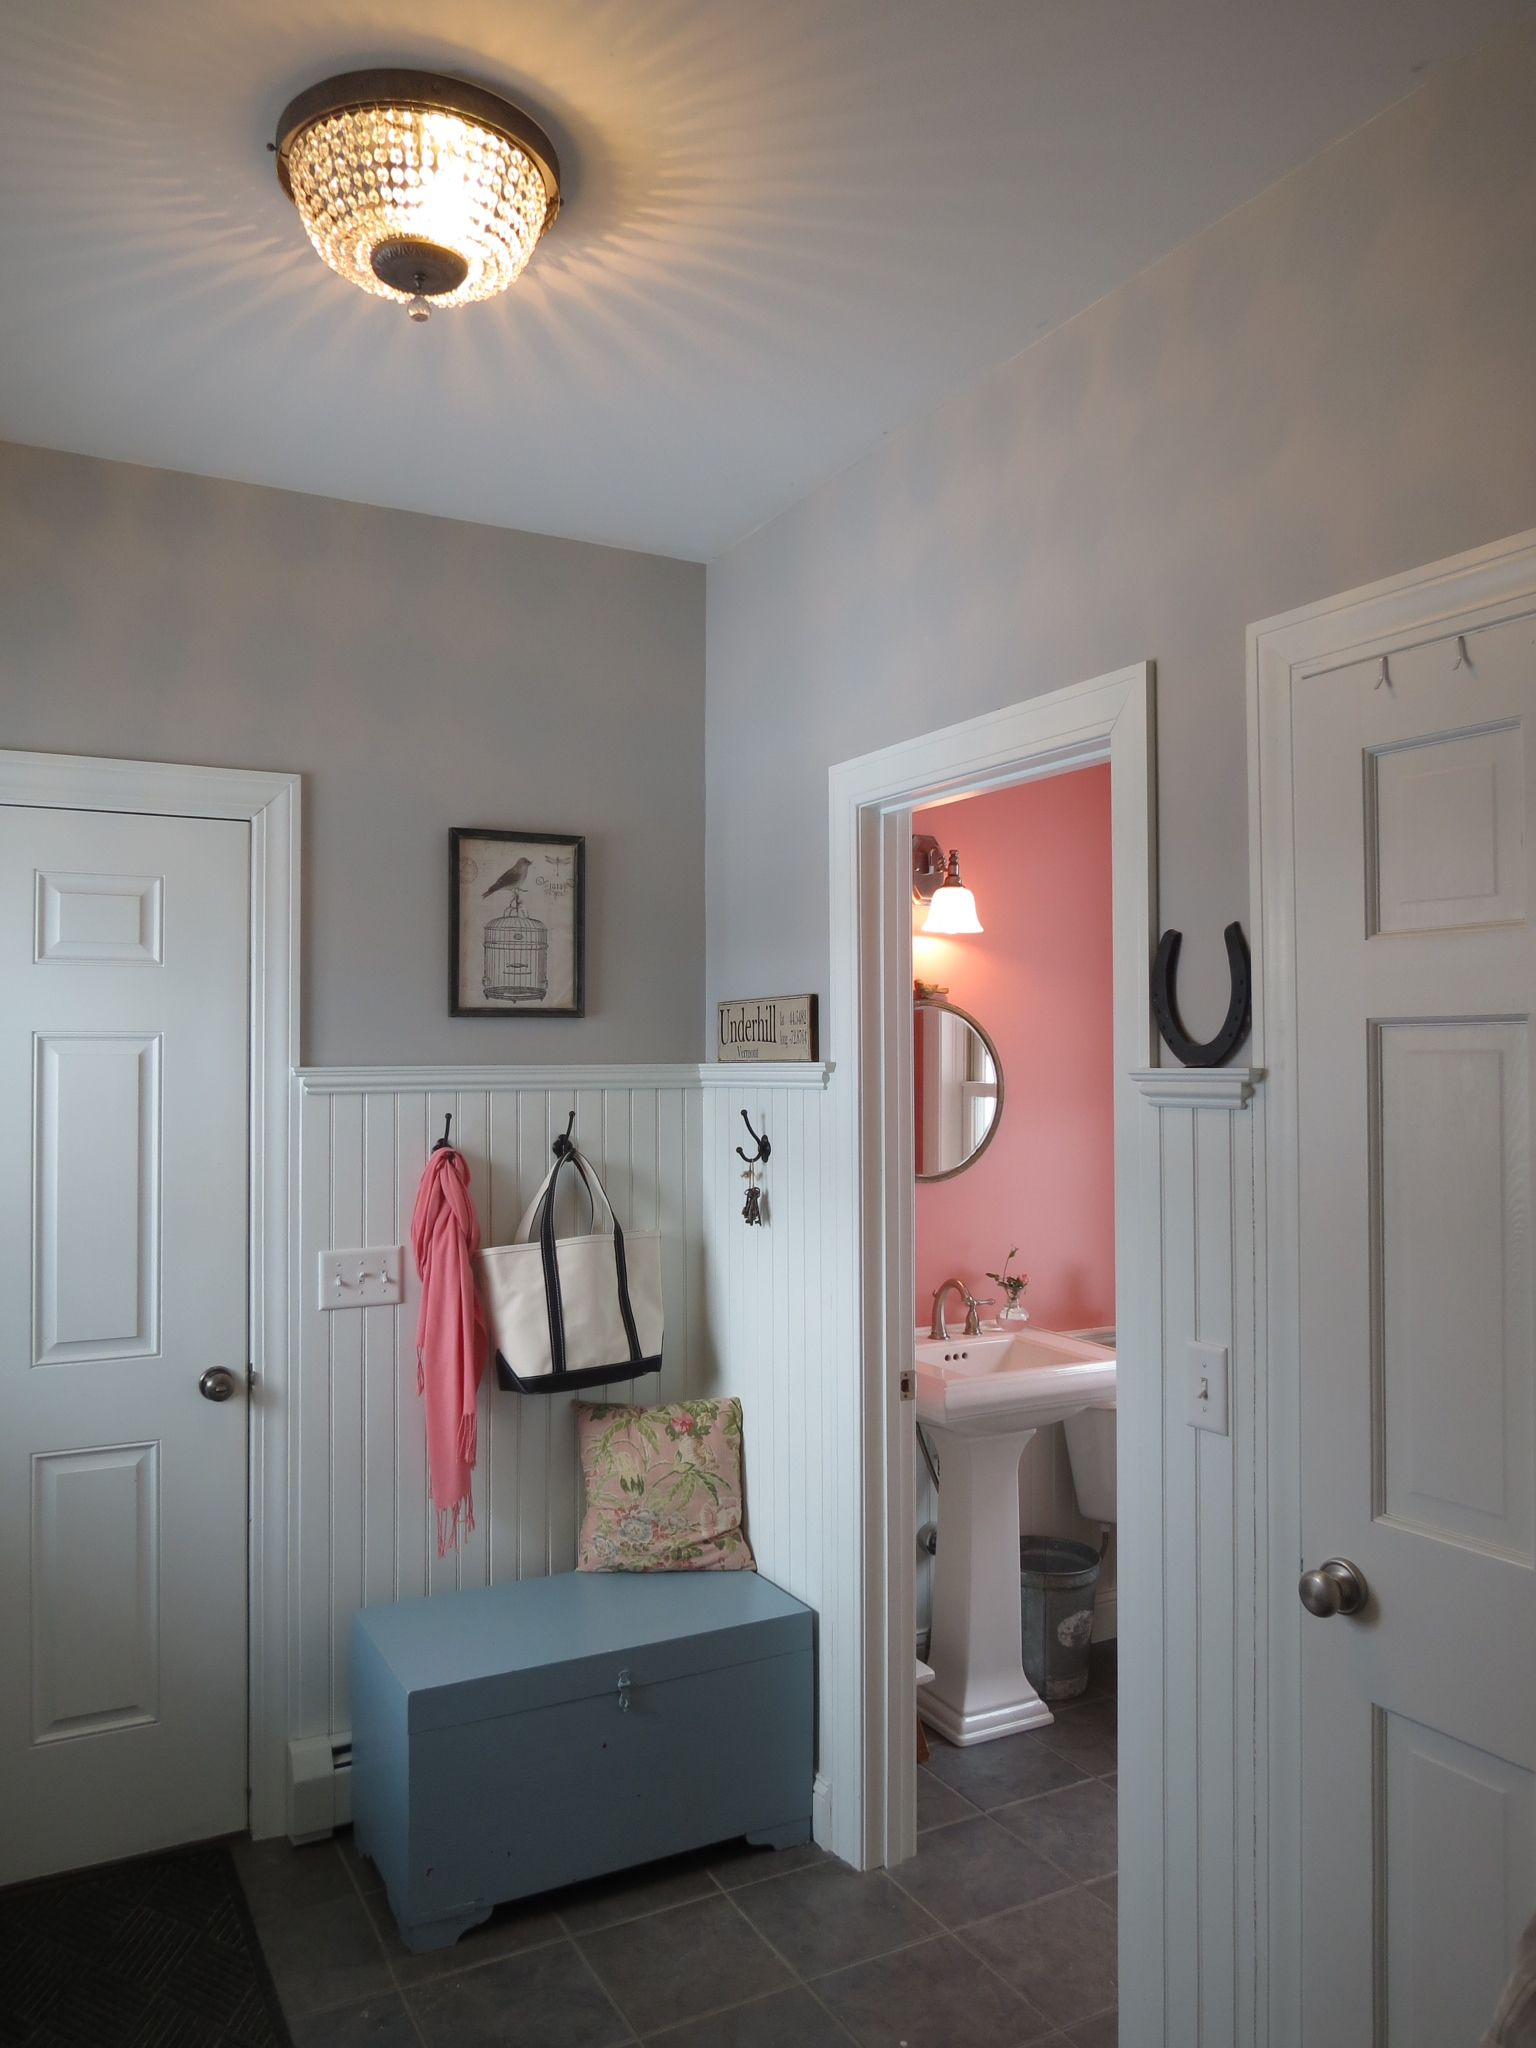 15 Home Paint Colors Smoke Embers Ideas Home Benjamin Moore Smoke Paint Colors